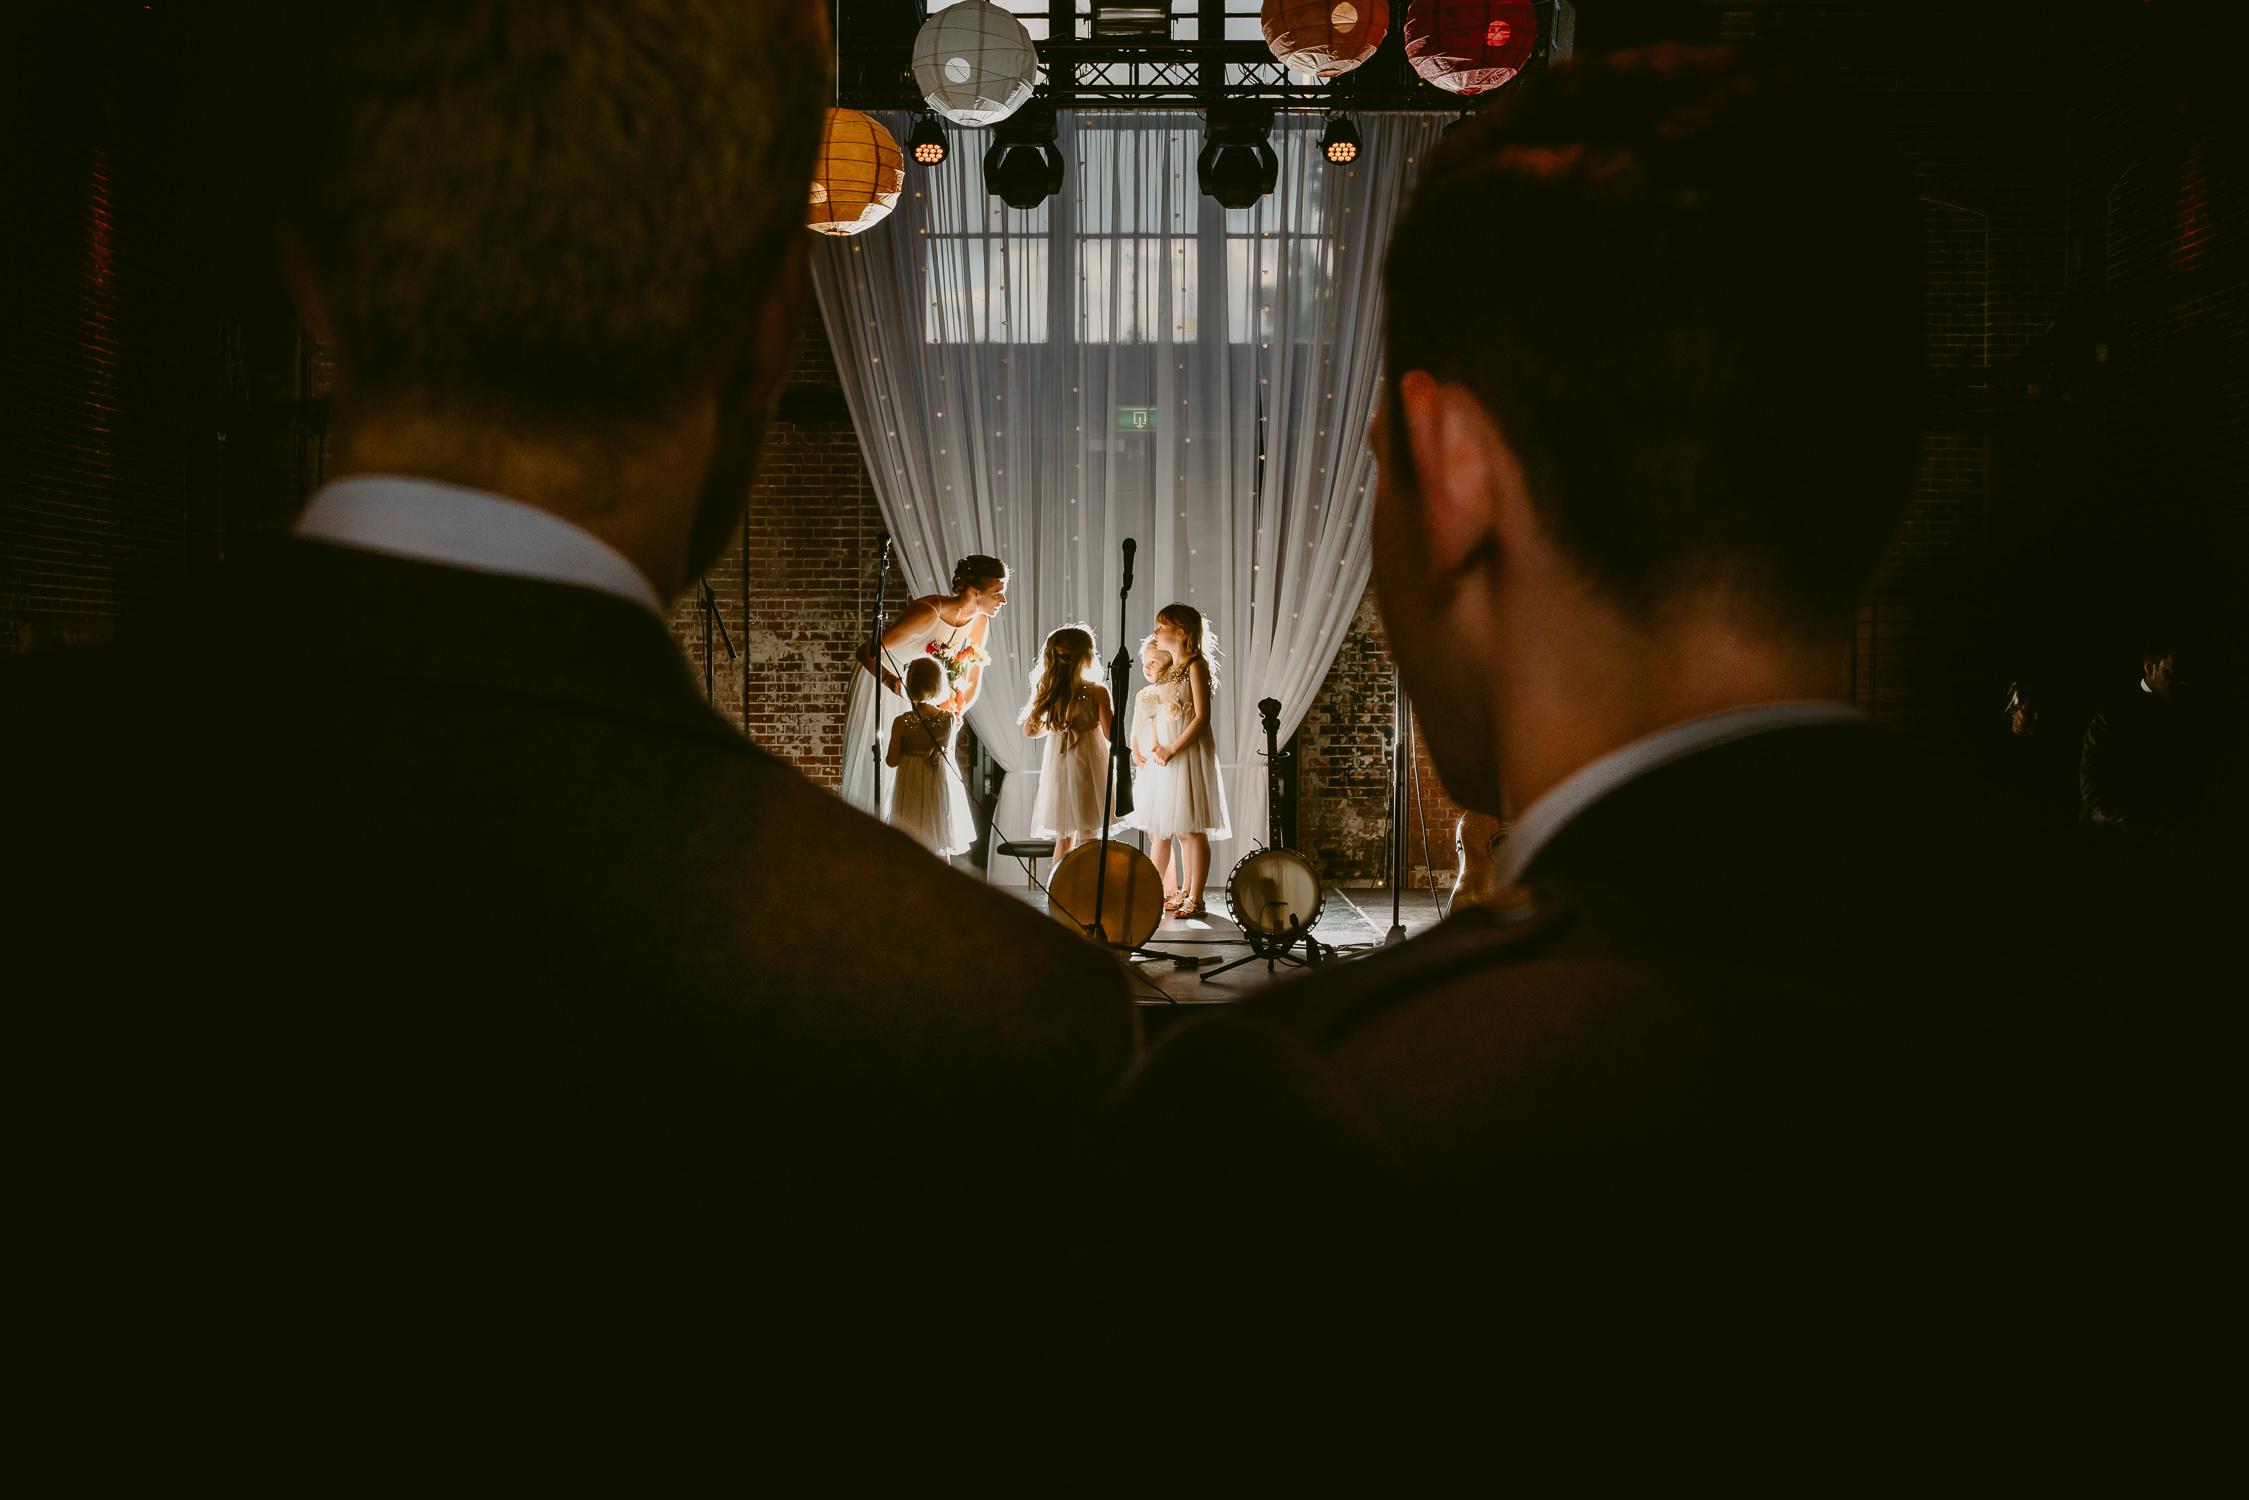 amsterdam bruidsfotografie Westergasfabriek mark hadden wedding photographer